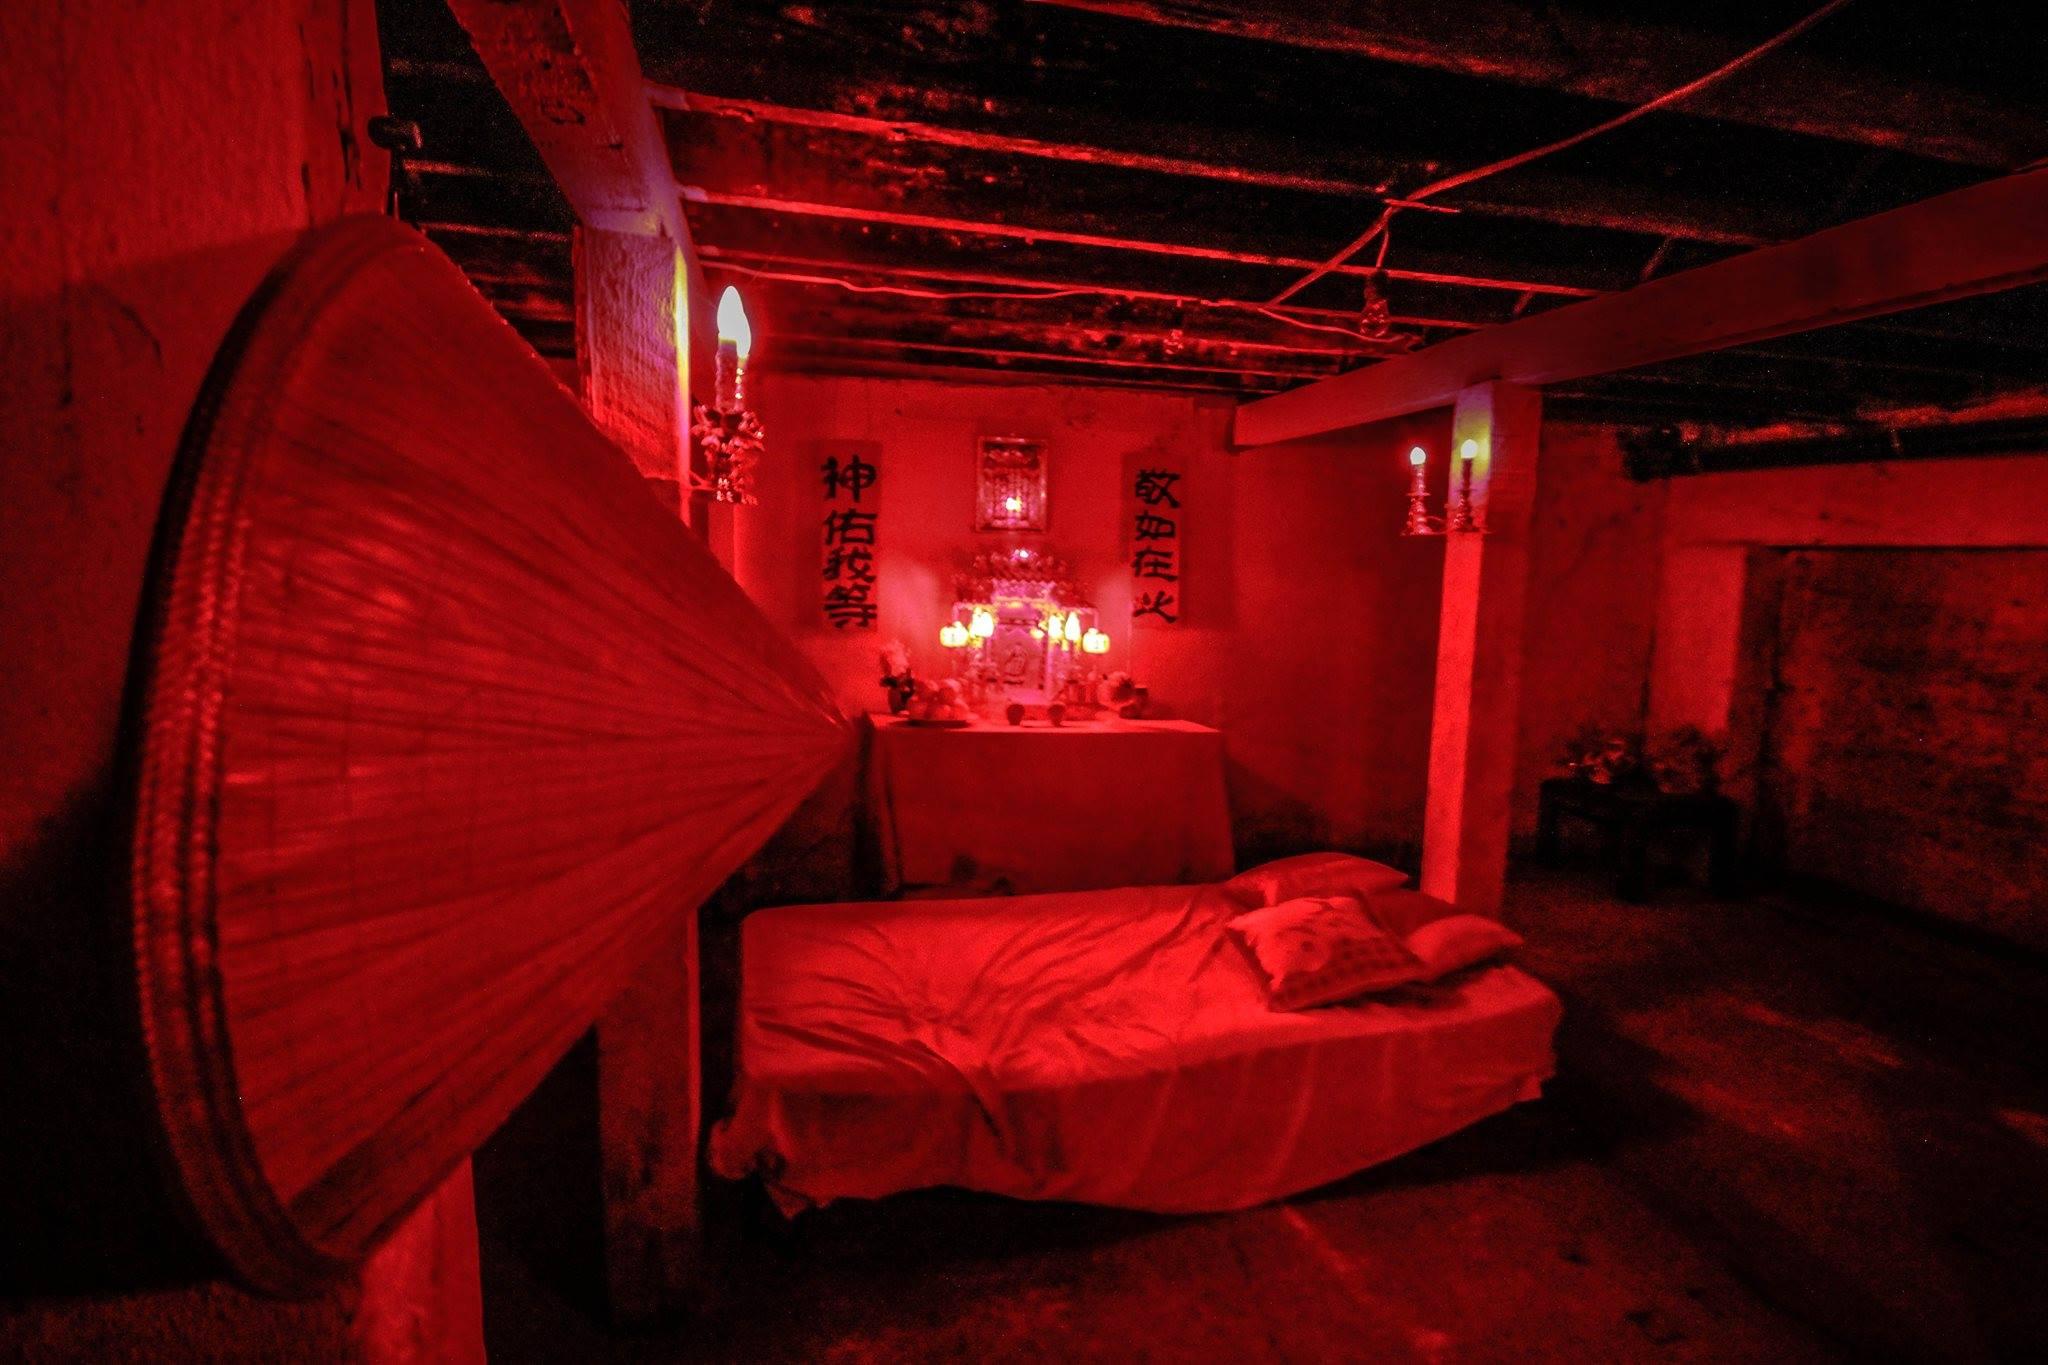 tuneles-chinos-en-mexicali-cuarto